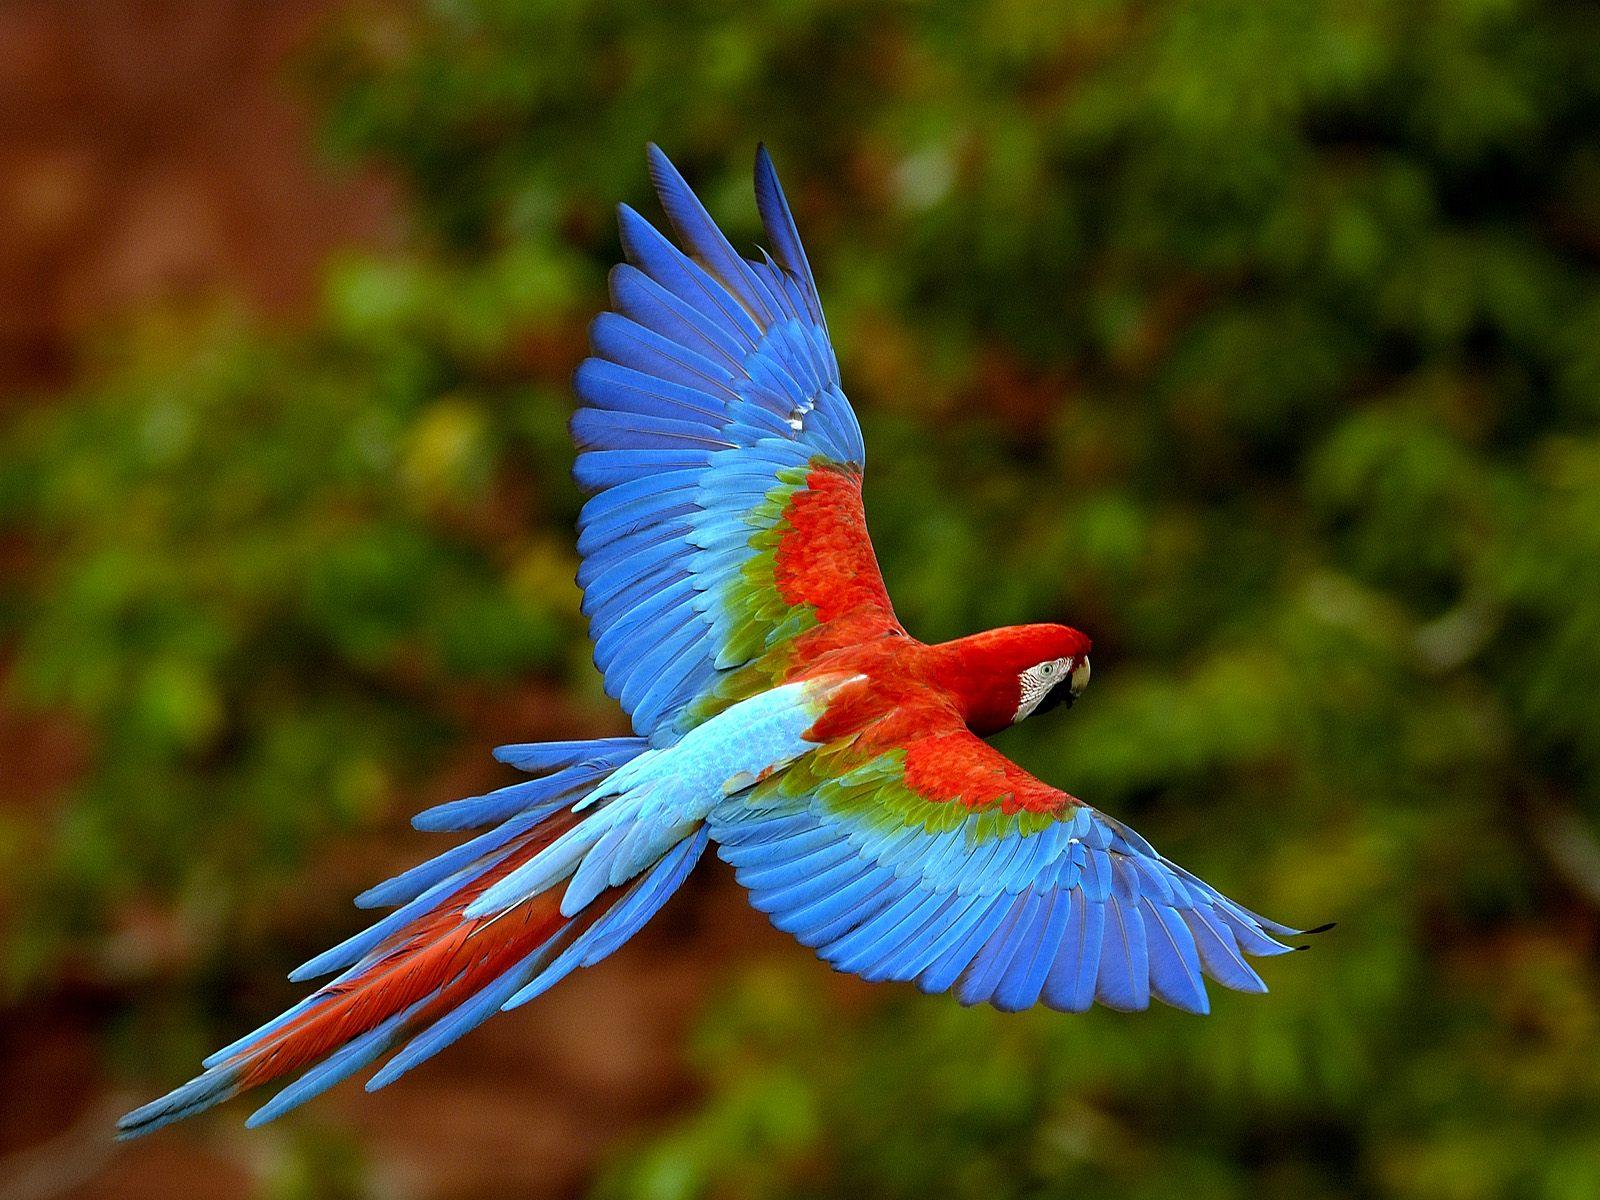 Humen Creations Amp Nature Wallpapers Amazon Rainforest